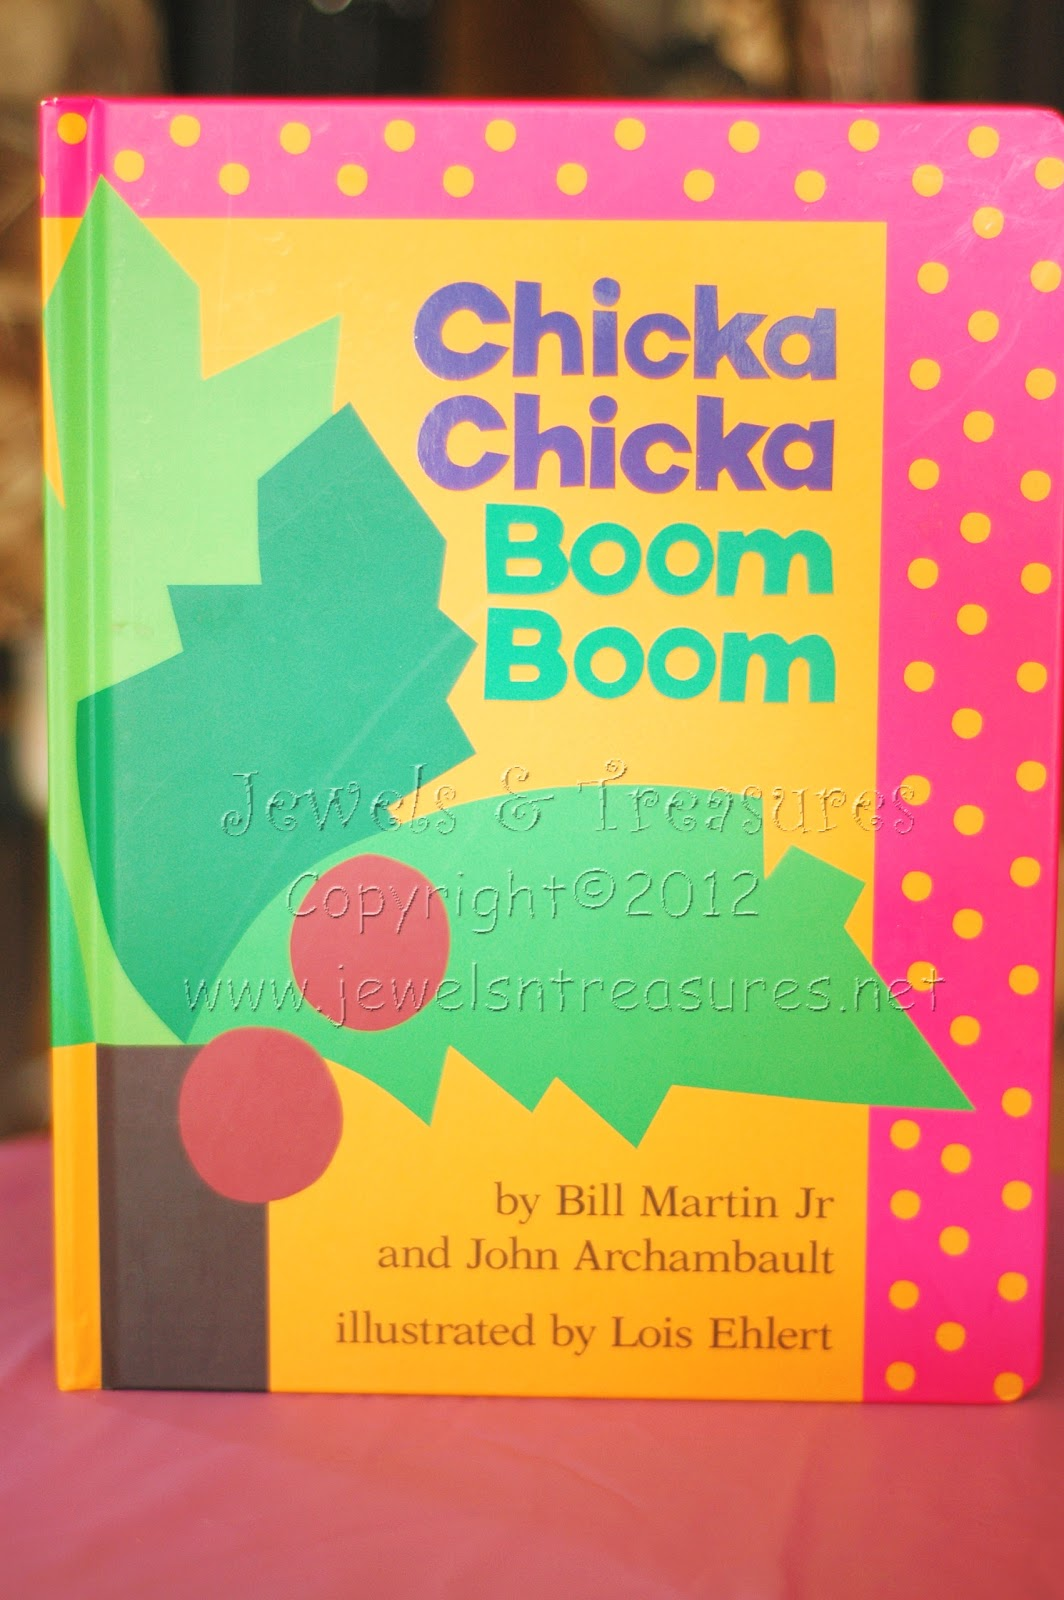 Jewels & Treasures: Chicka Chicka Boom Boom Birthday Party - photo#18